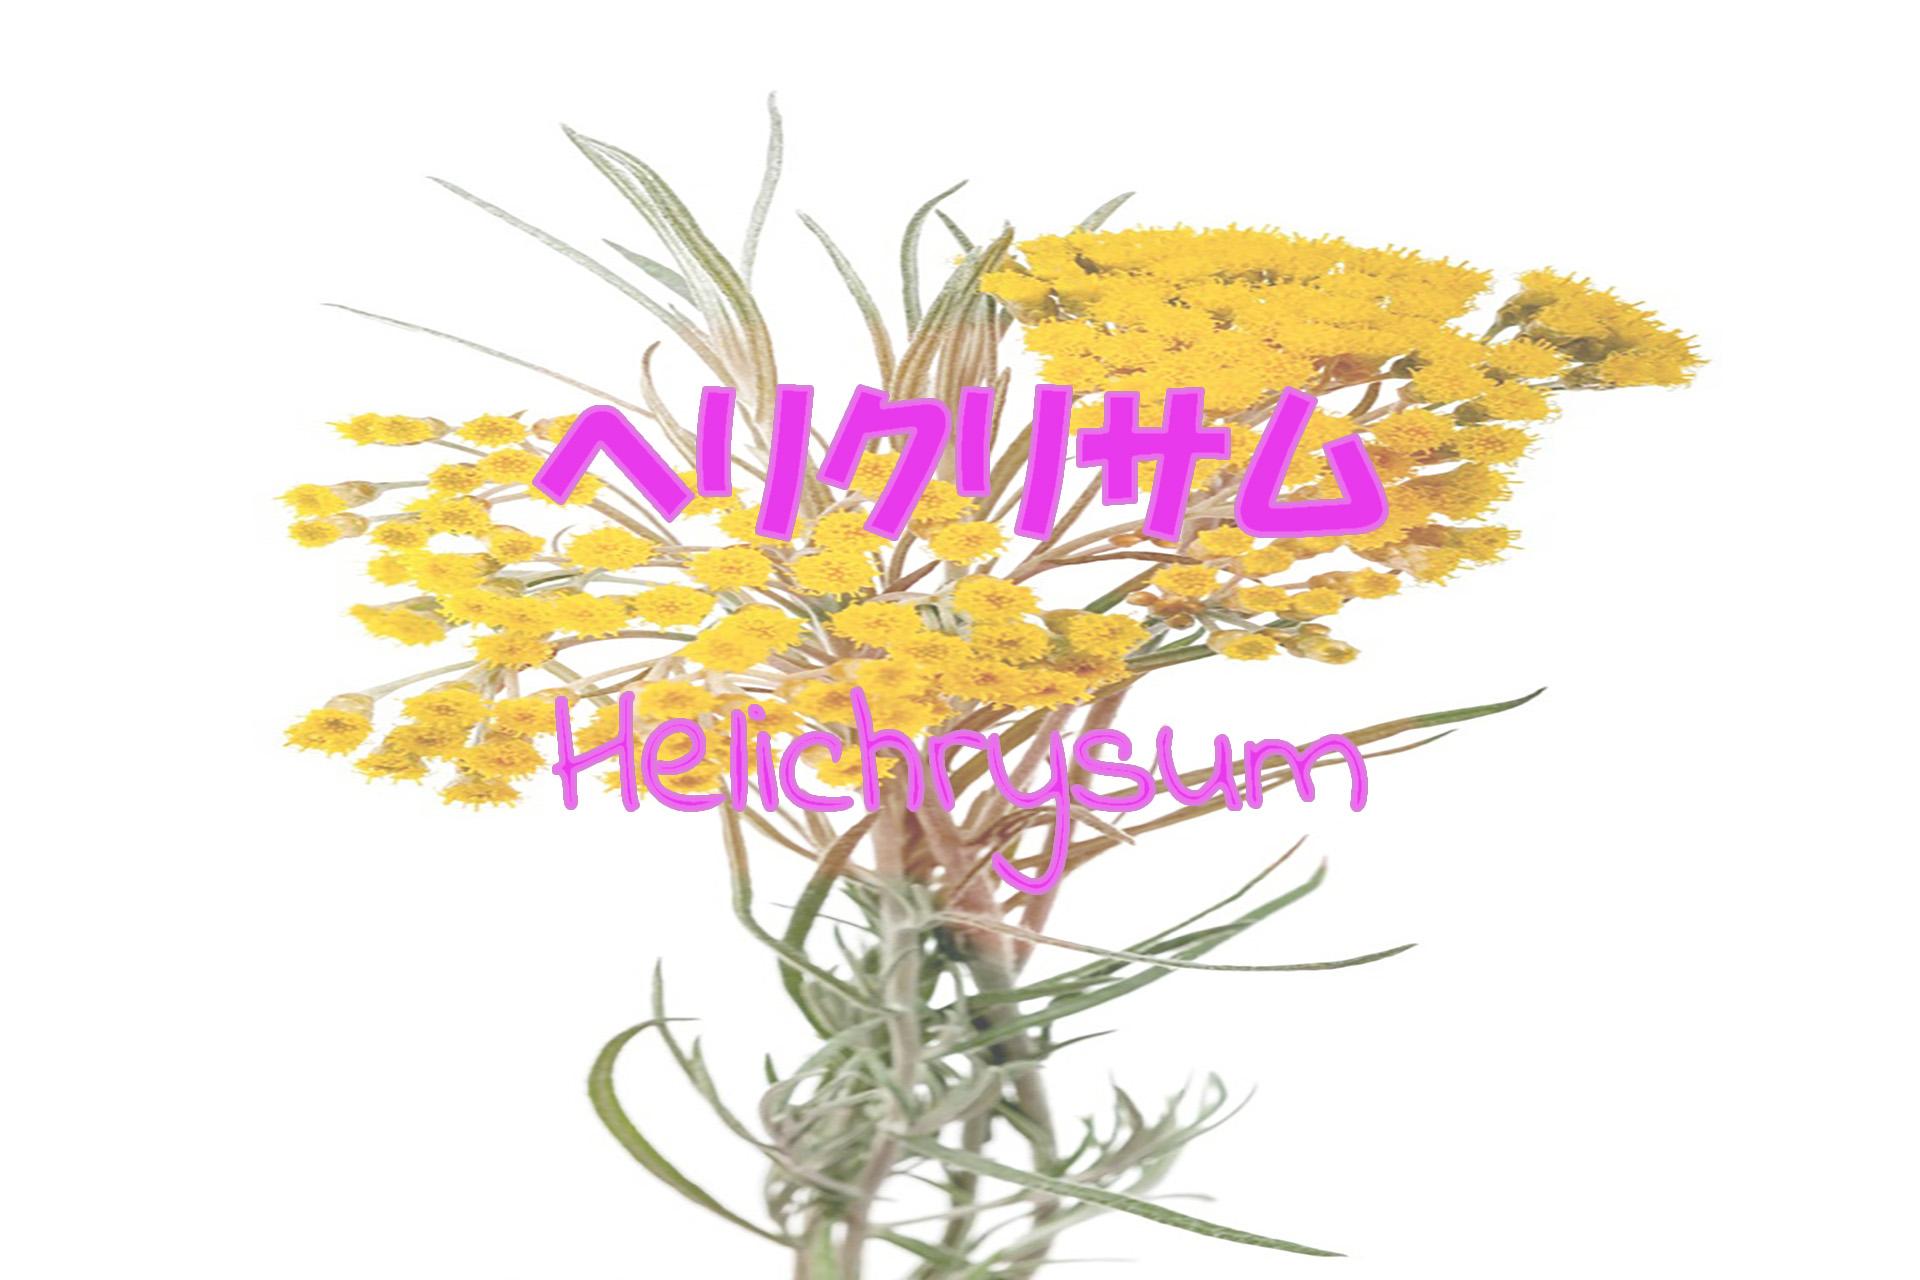 helichrysum_191117